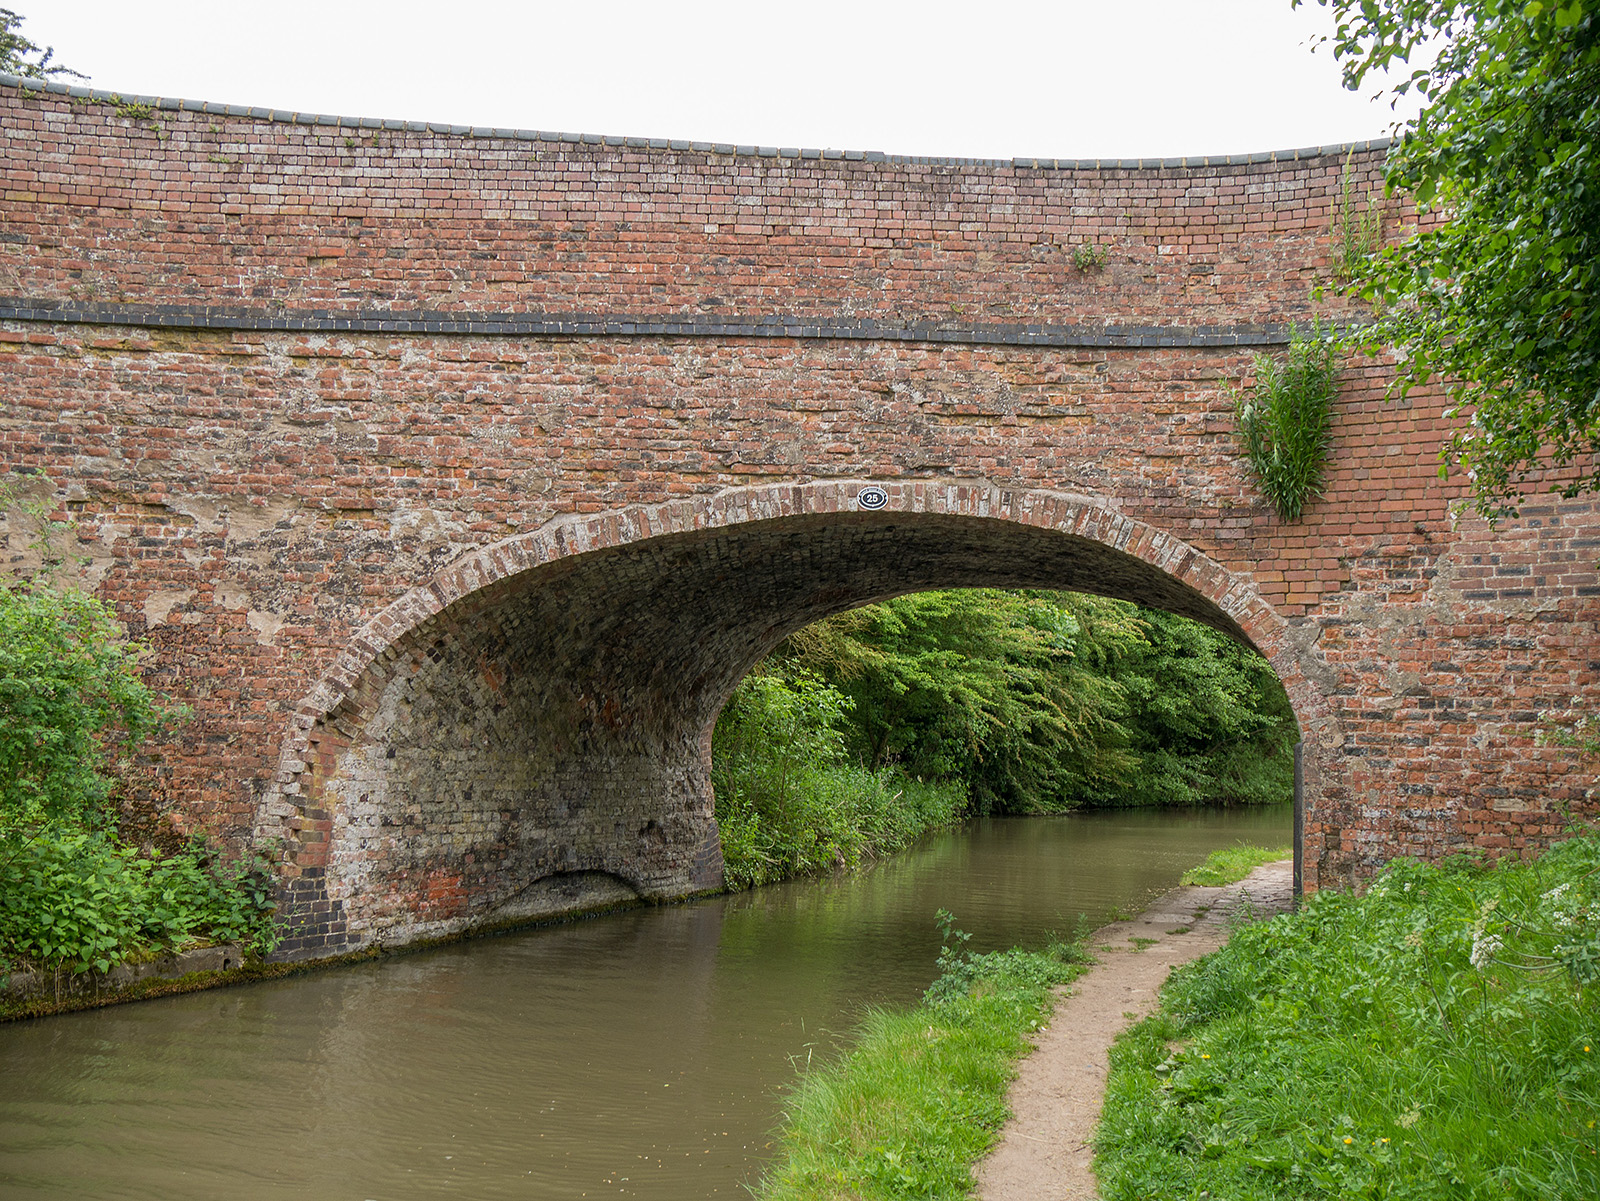 Bridge 25 - Weedon Beck bridge